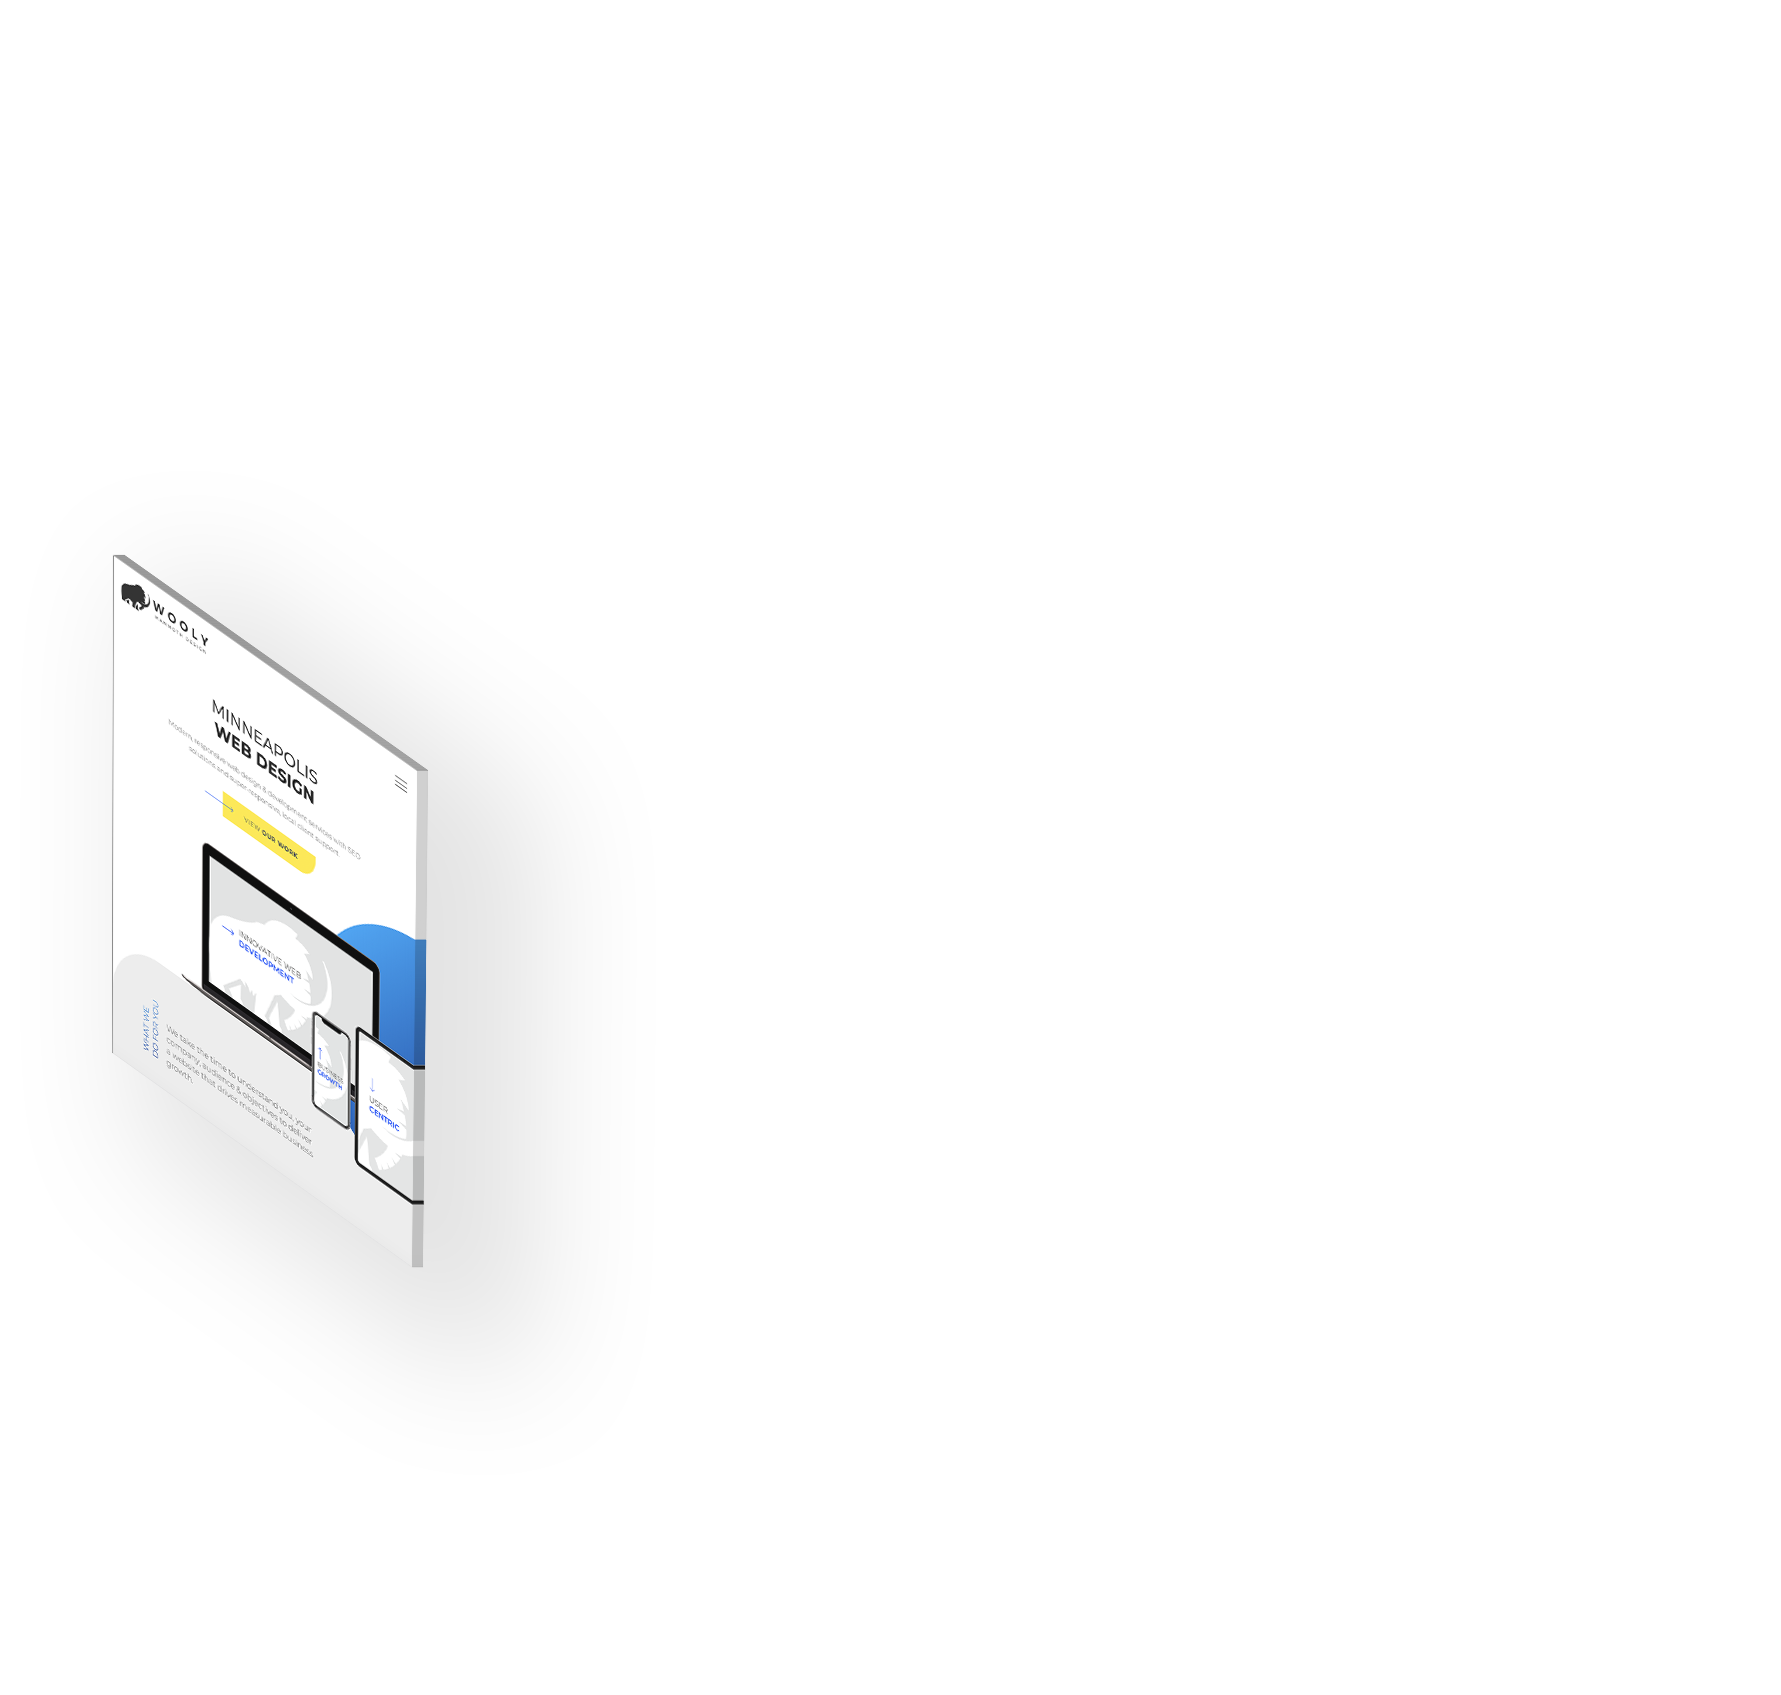 Tablet screen with website design mockup